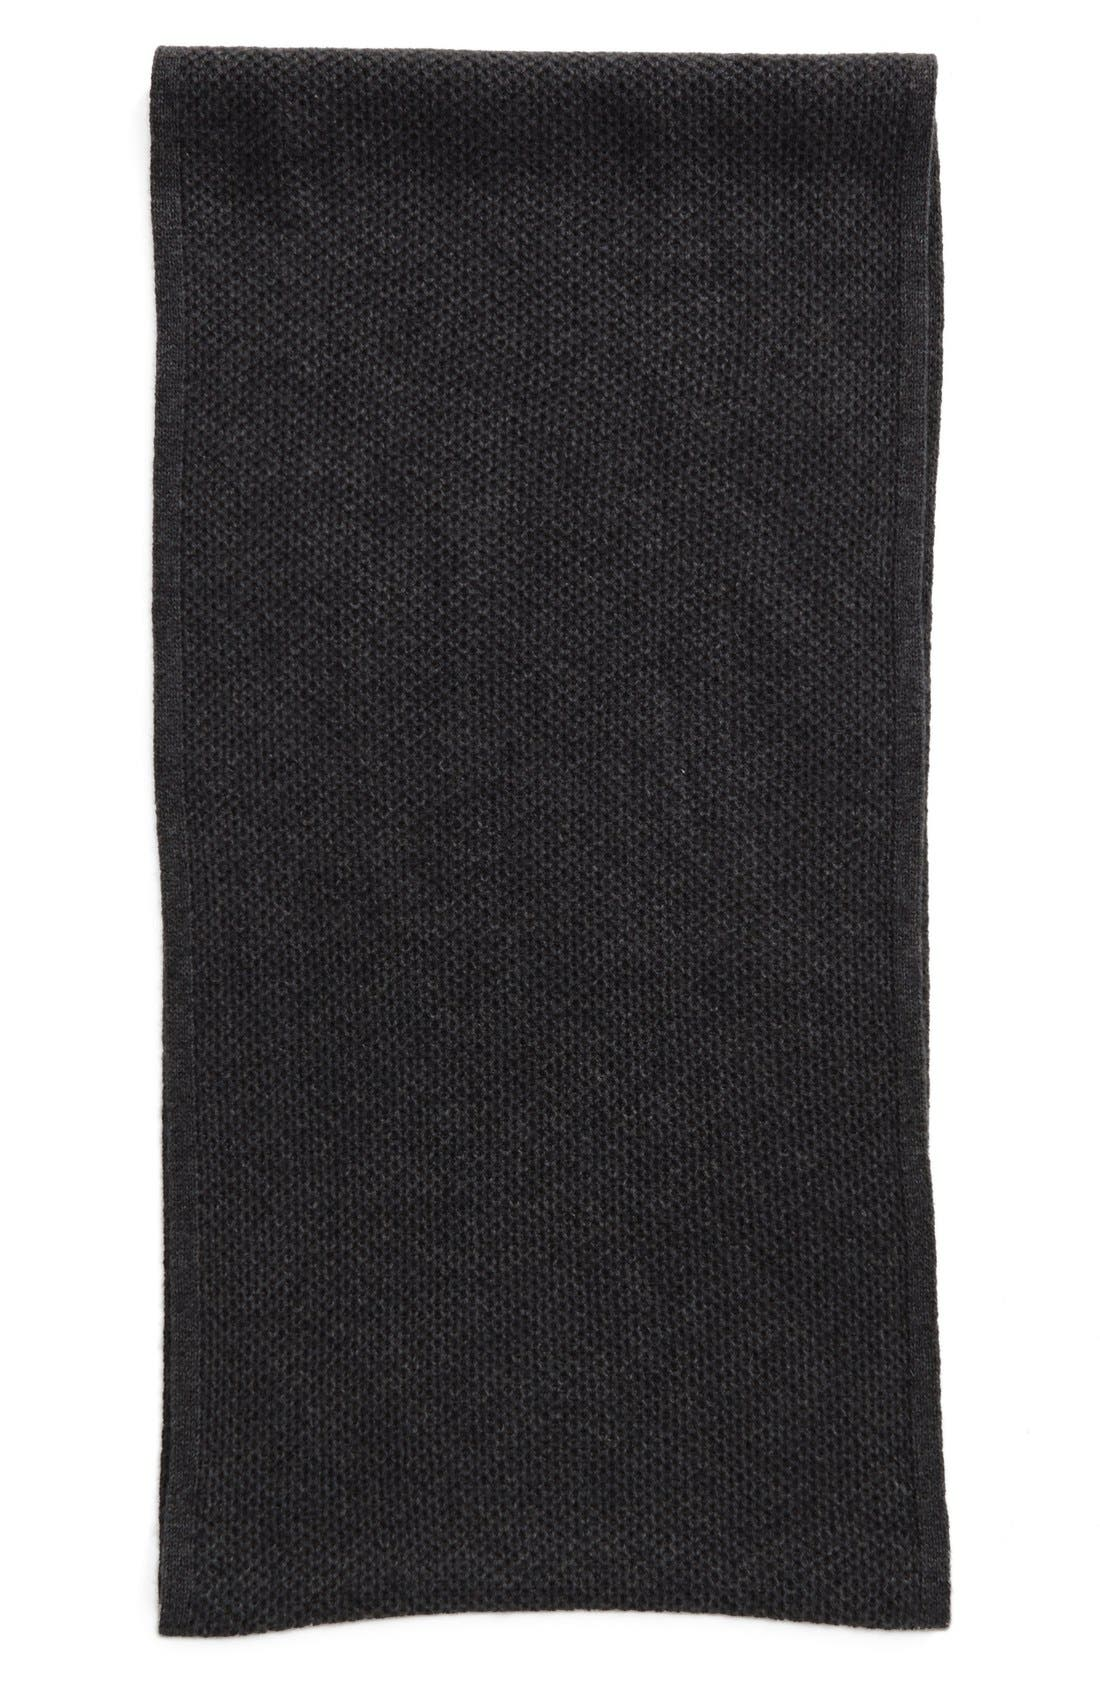 Alternate Image 2  - Halogen® Knit Cashmere Infinity Scarf